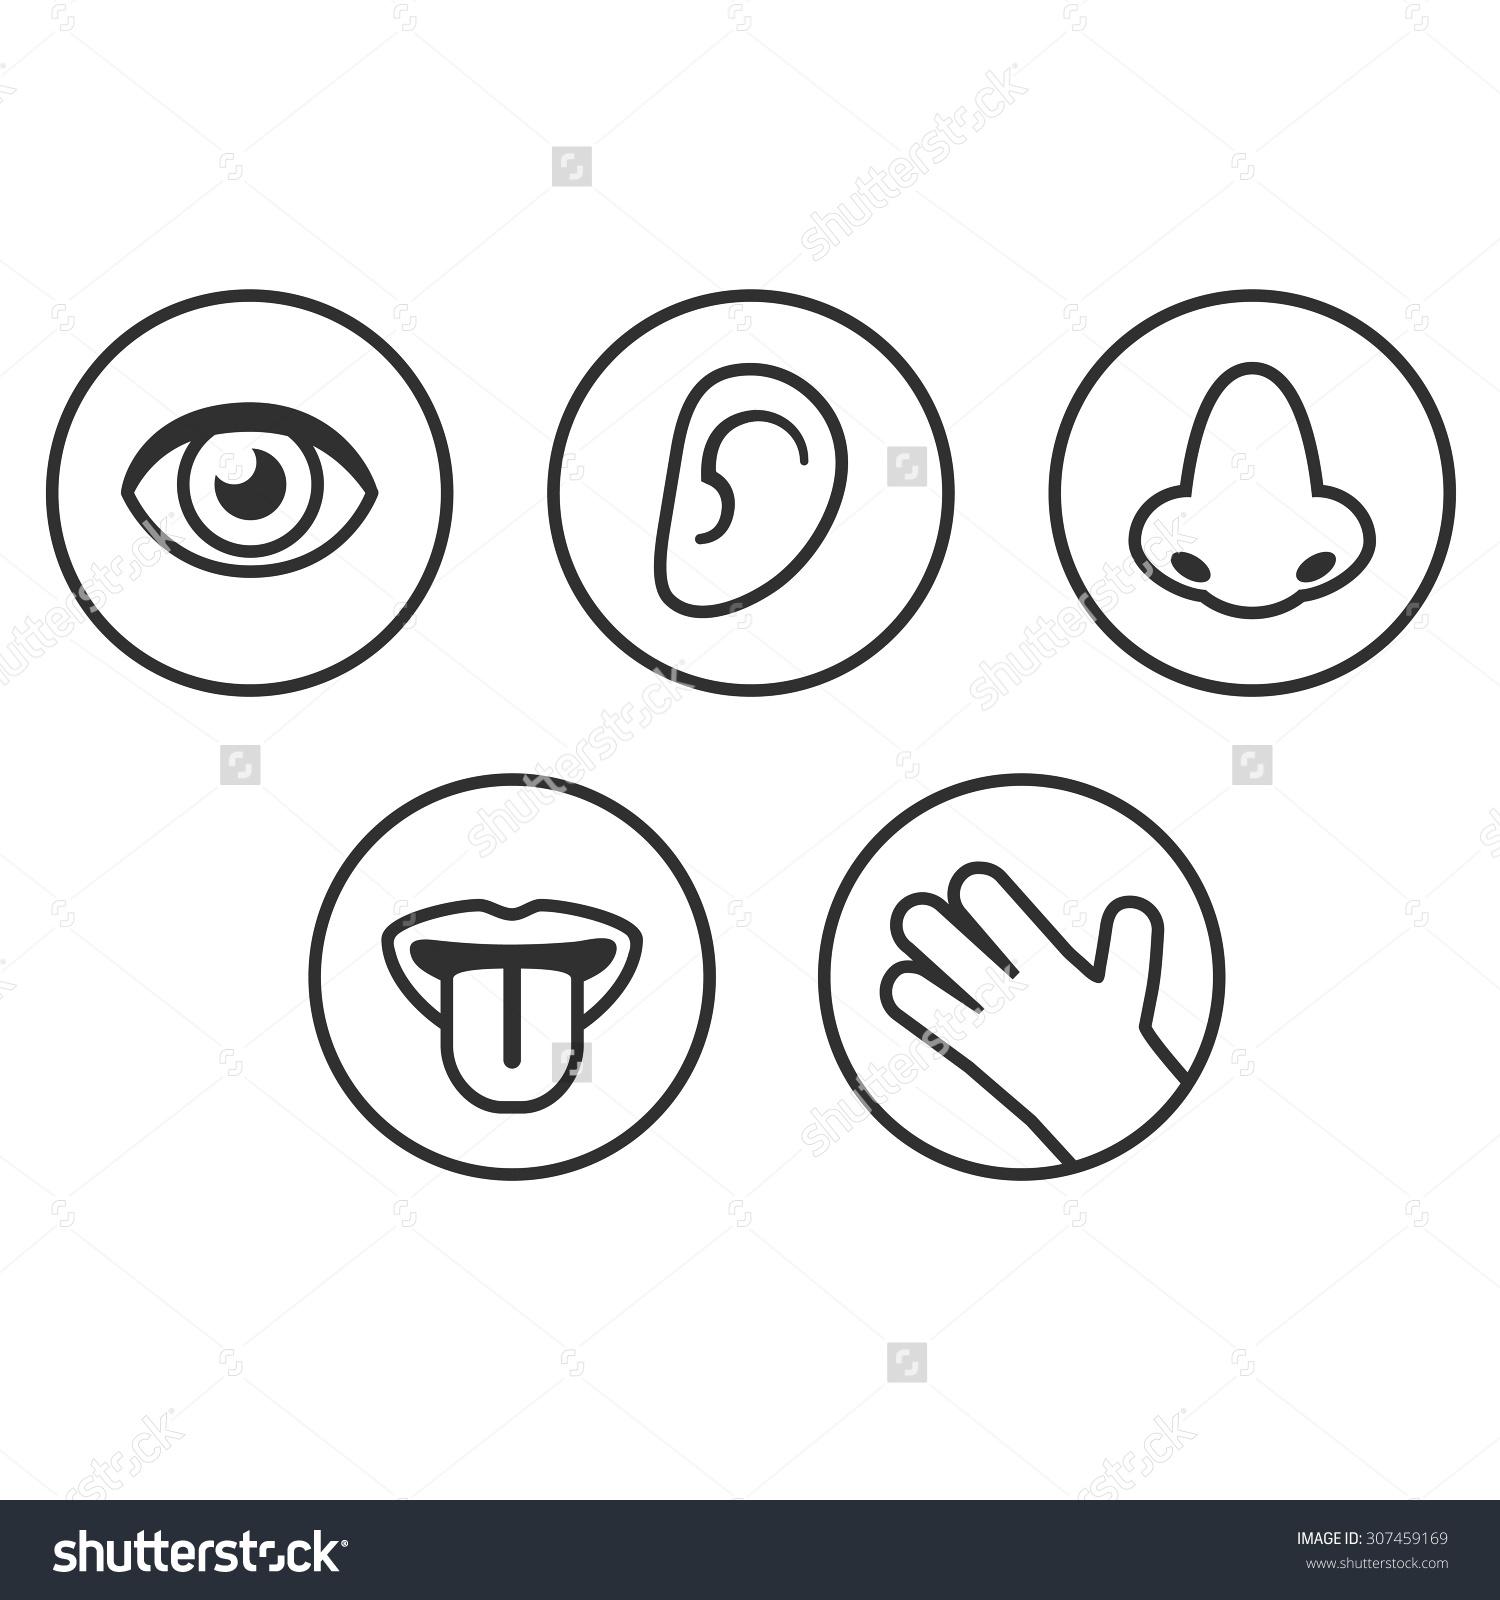 5 Senses Clipart Icon Pictures On Cliparts Pub